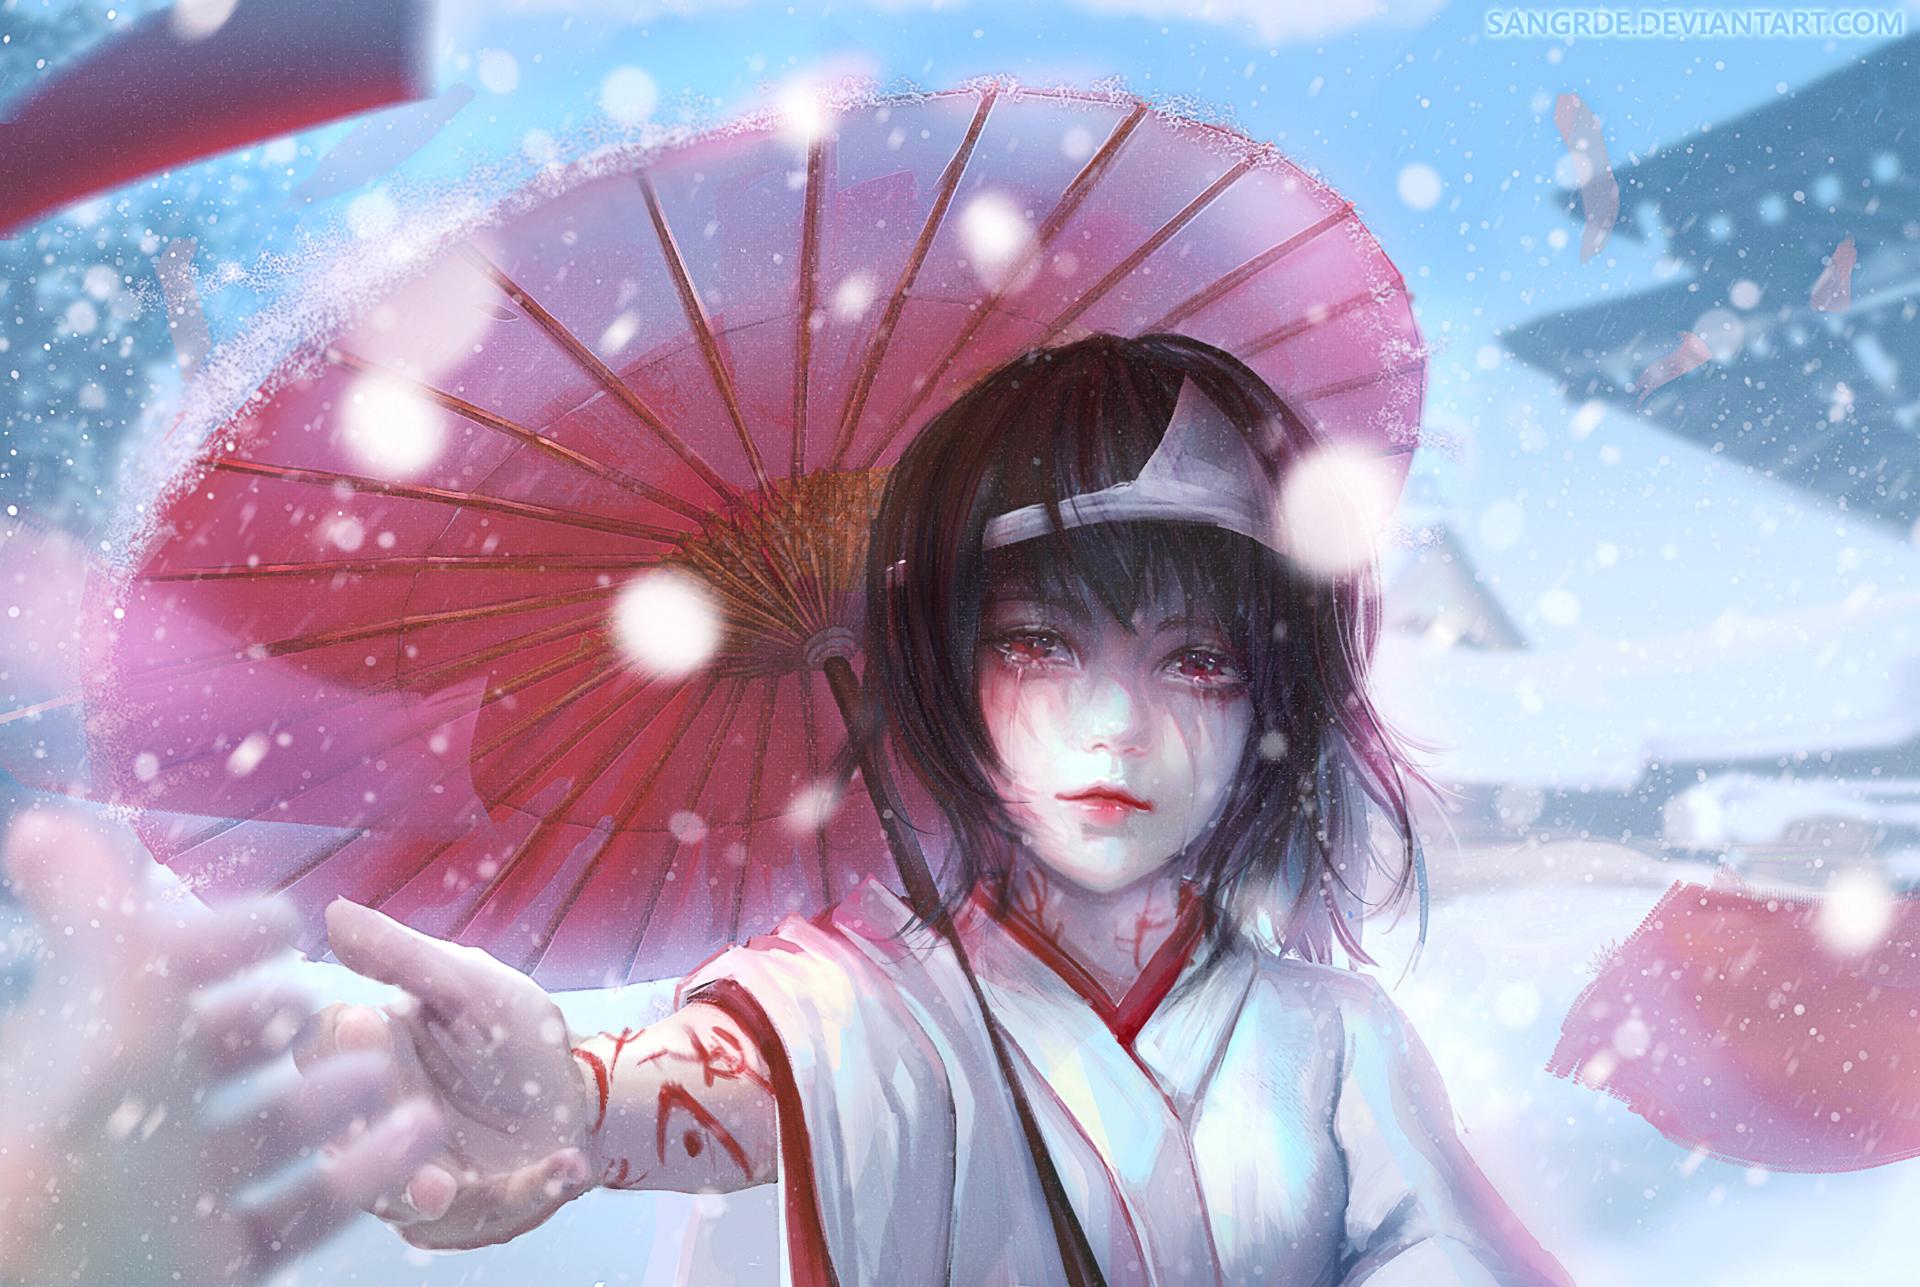 Anime 1920x1287 Noragami anime girls Nora (Noragami) umbrella anime hands snow winter DeviantArt